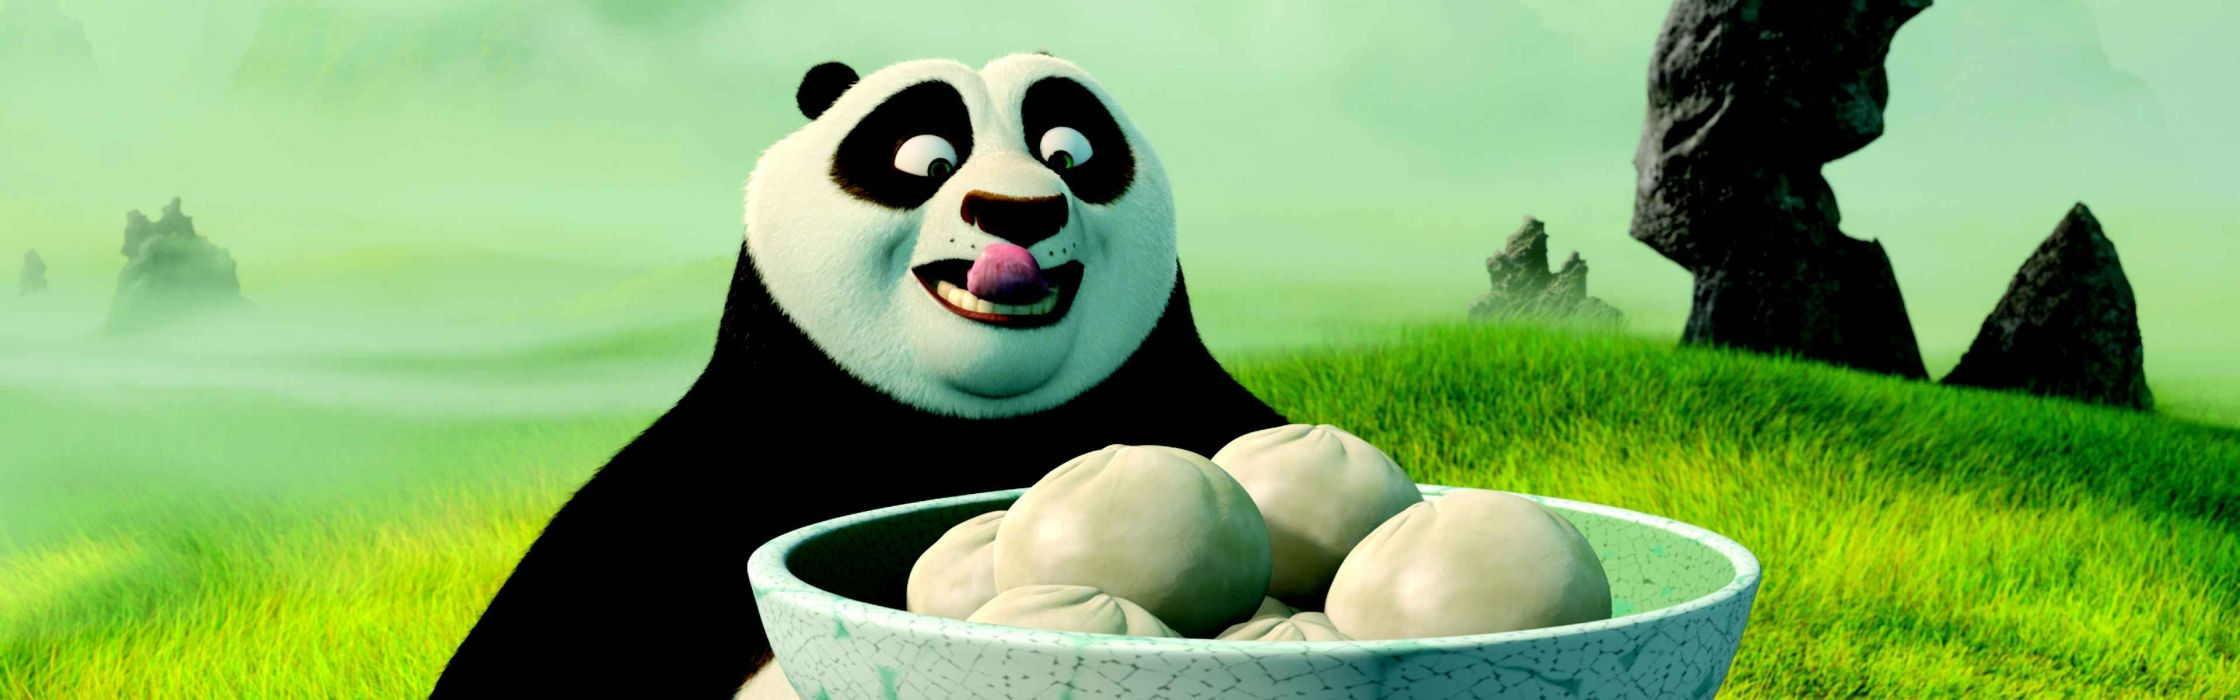 kung fu panda wallpaper | 3840x1200 | 17990 | wallpaperup